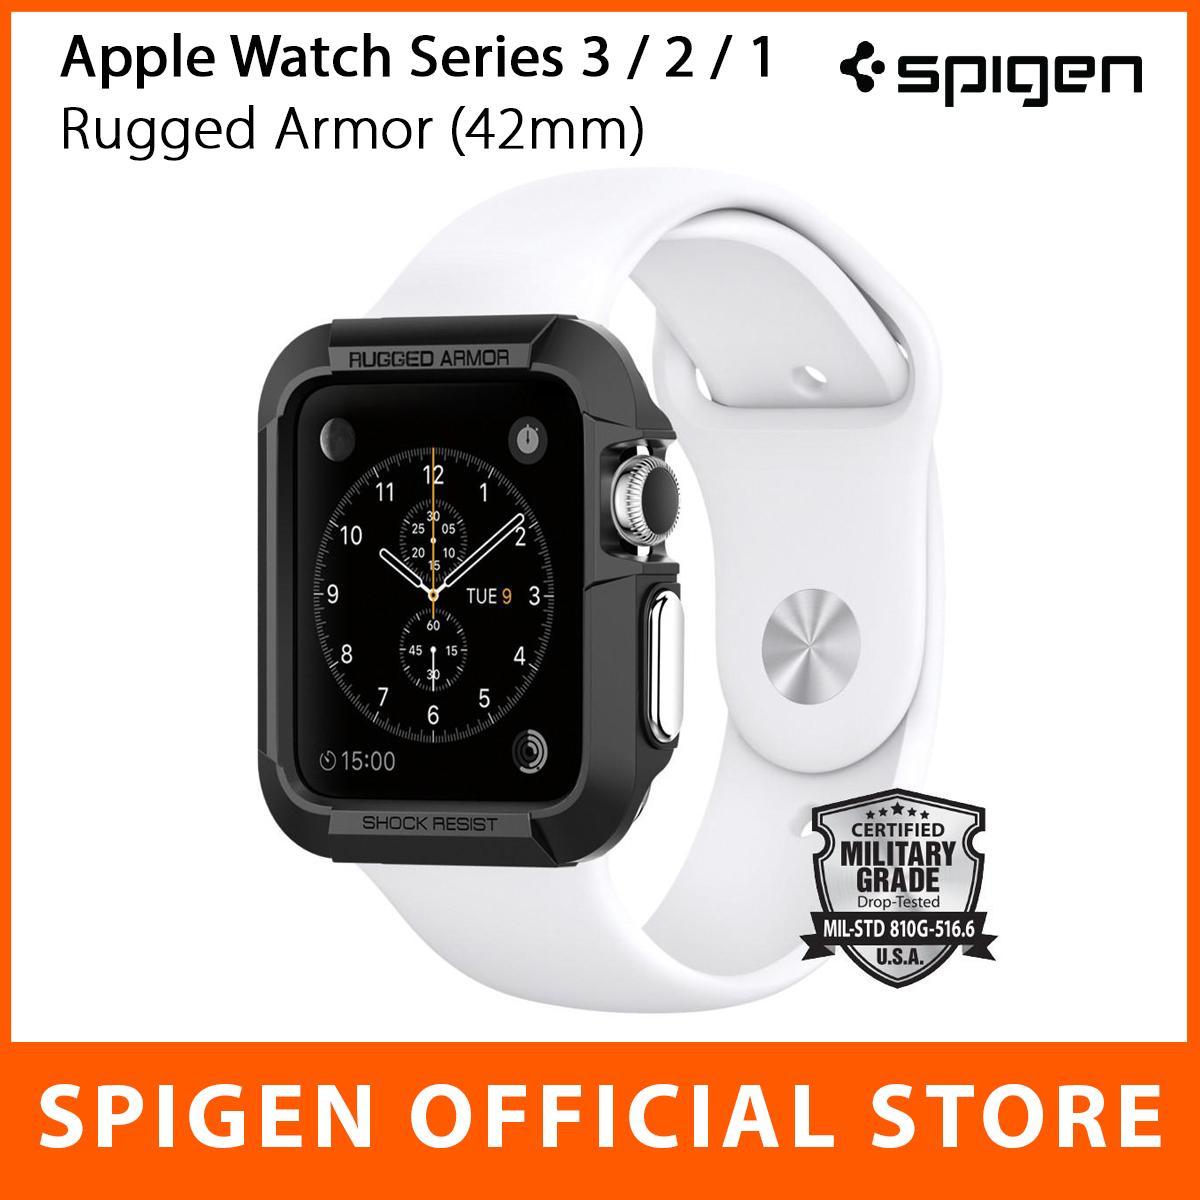 Buy Designer Smartwatches Cases Watches Lazada Spigen Apple Watch Rugged Armor Case 38mm Tpu Softcase Original